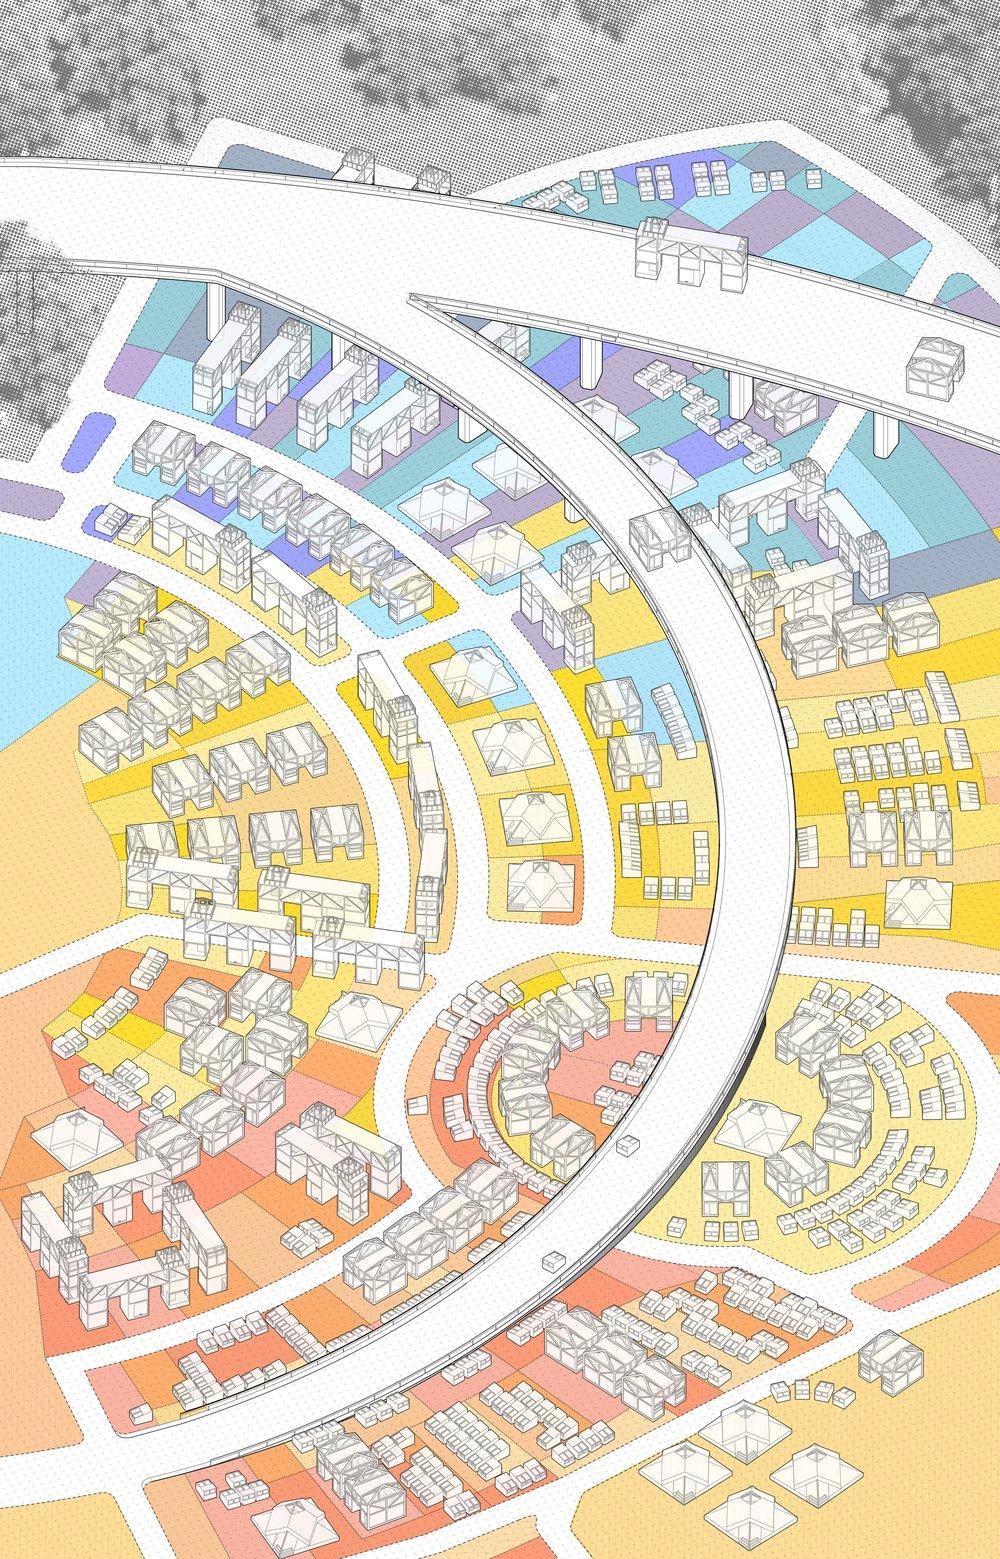 Jiggly Urbanism